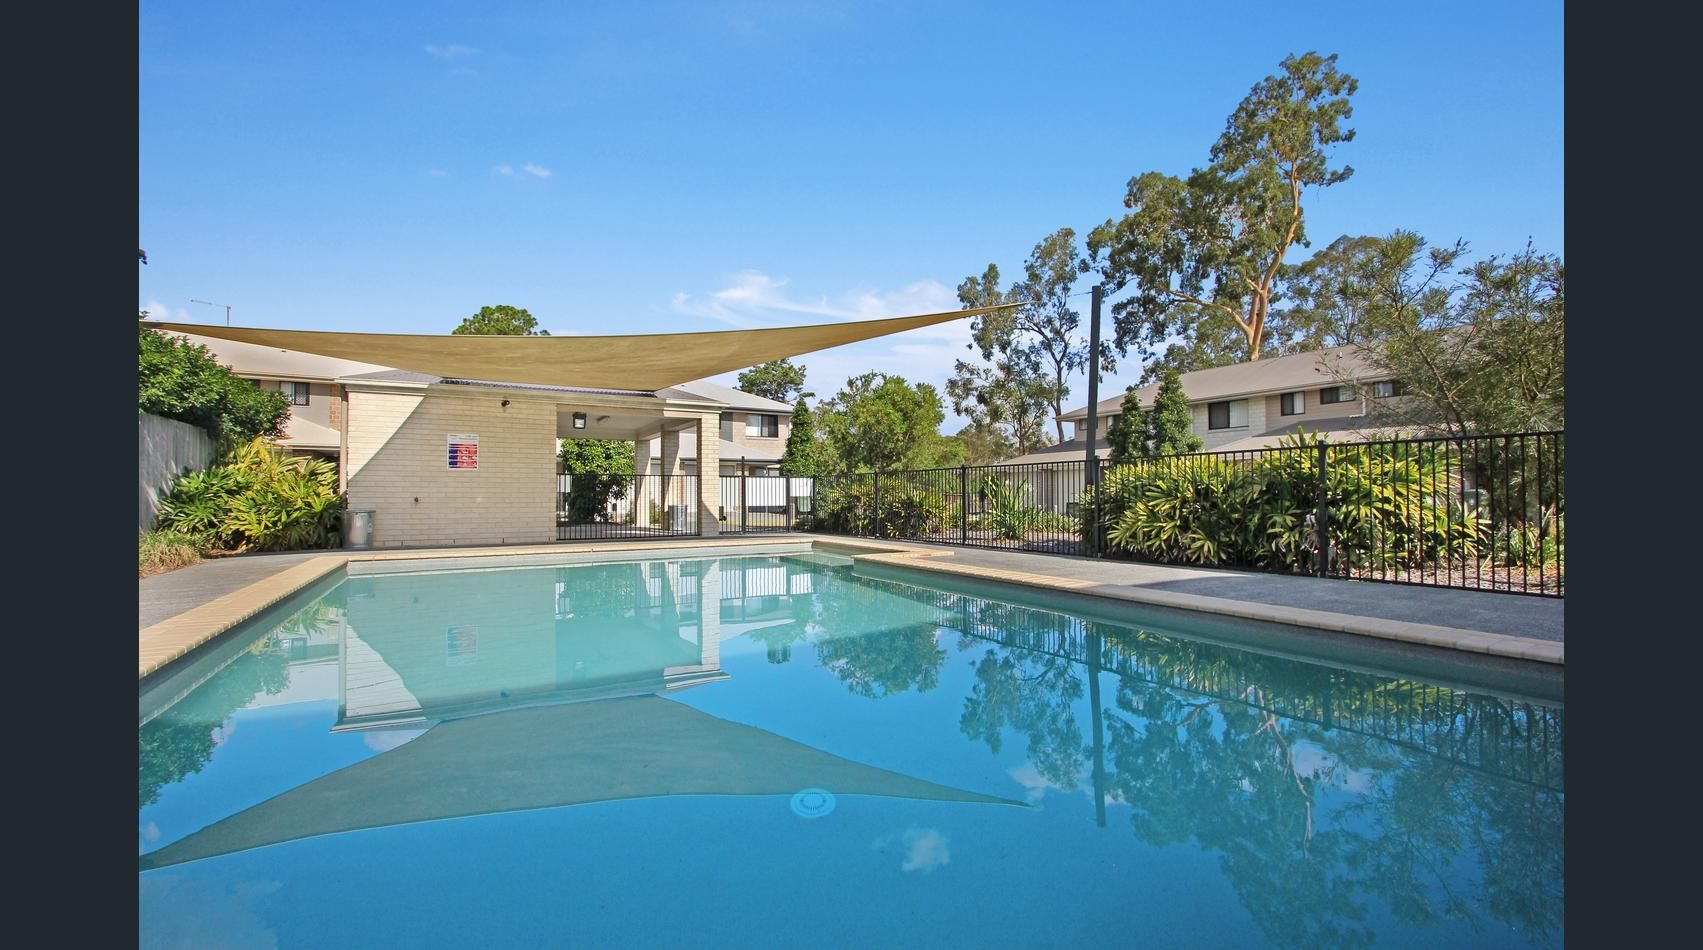 5/44 Rockfield Rd, Doolandella QLD 4077, Image 0